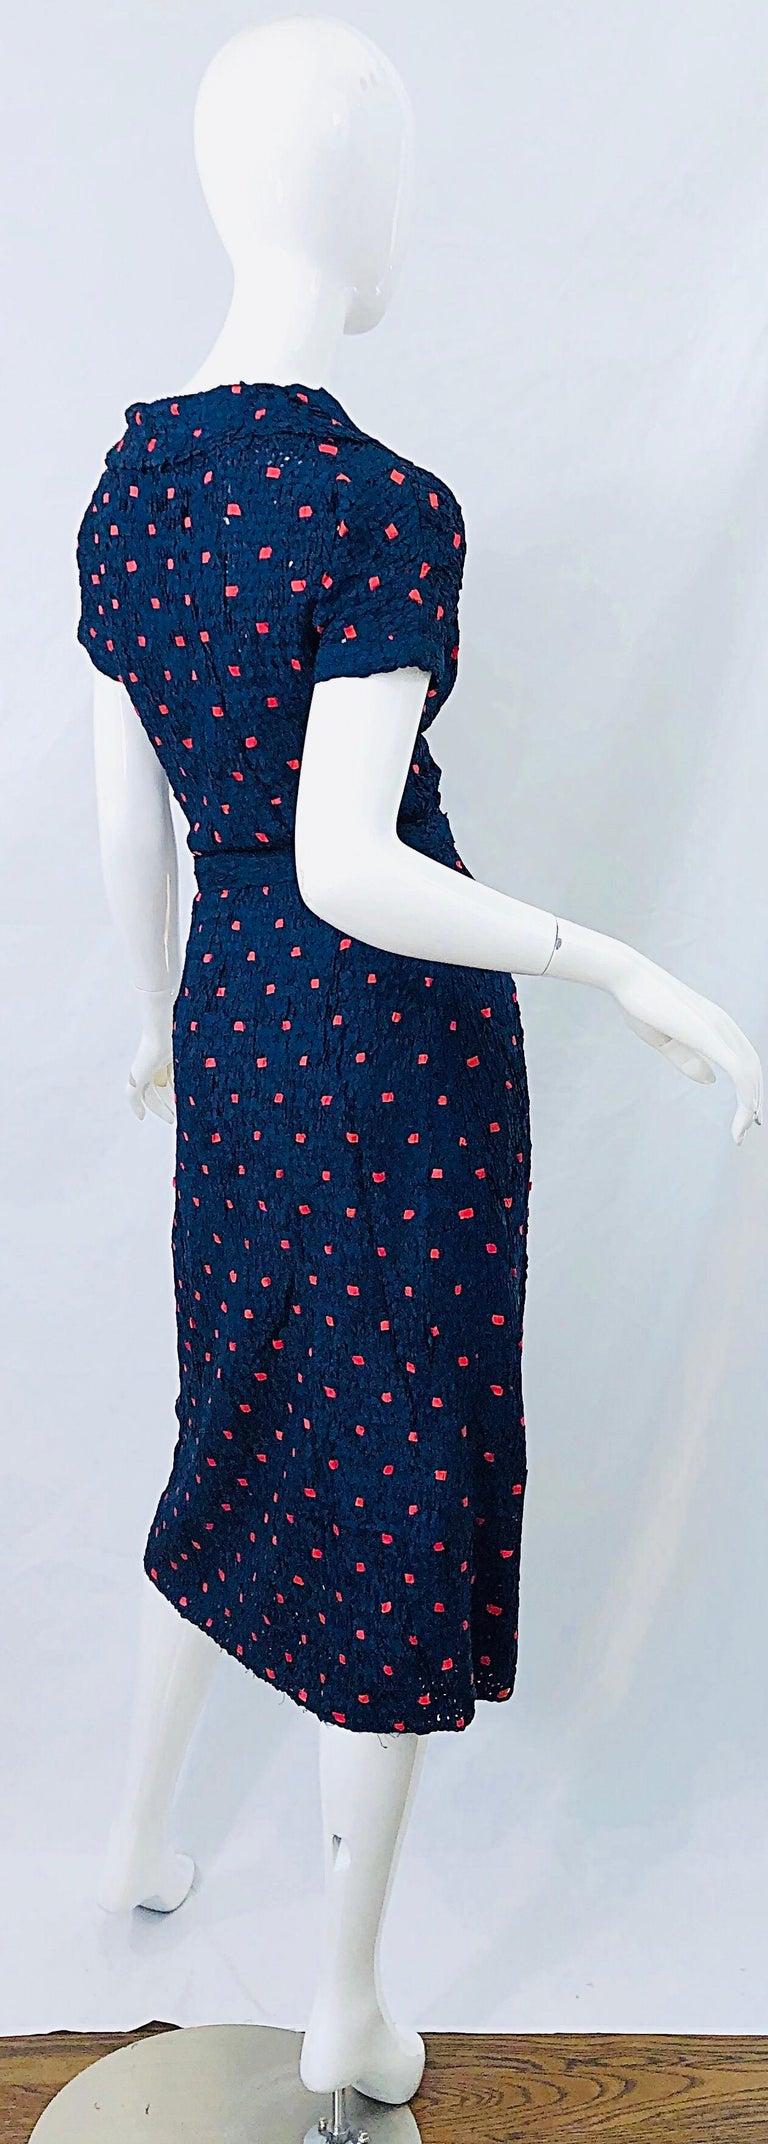 Women's 1950s Ann Fleischer for I Magnin Hand Ribbon Knit Navy Blue + Red Vintage Dress For Sale